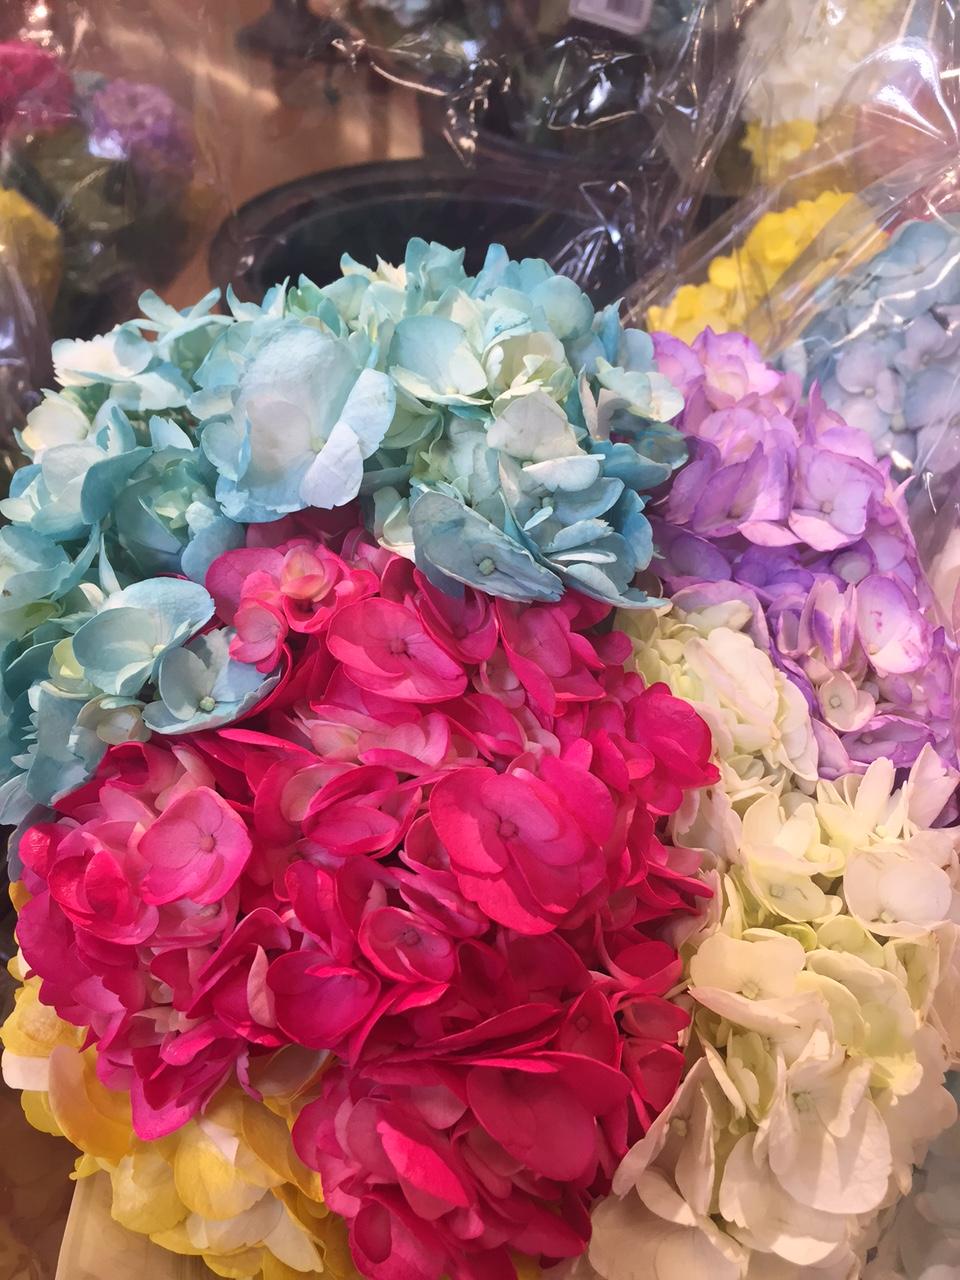 Artificially Dyed Flowers, Mums & Pumpkins – Gina Diamond\'s Flower Co.